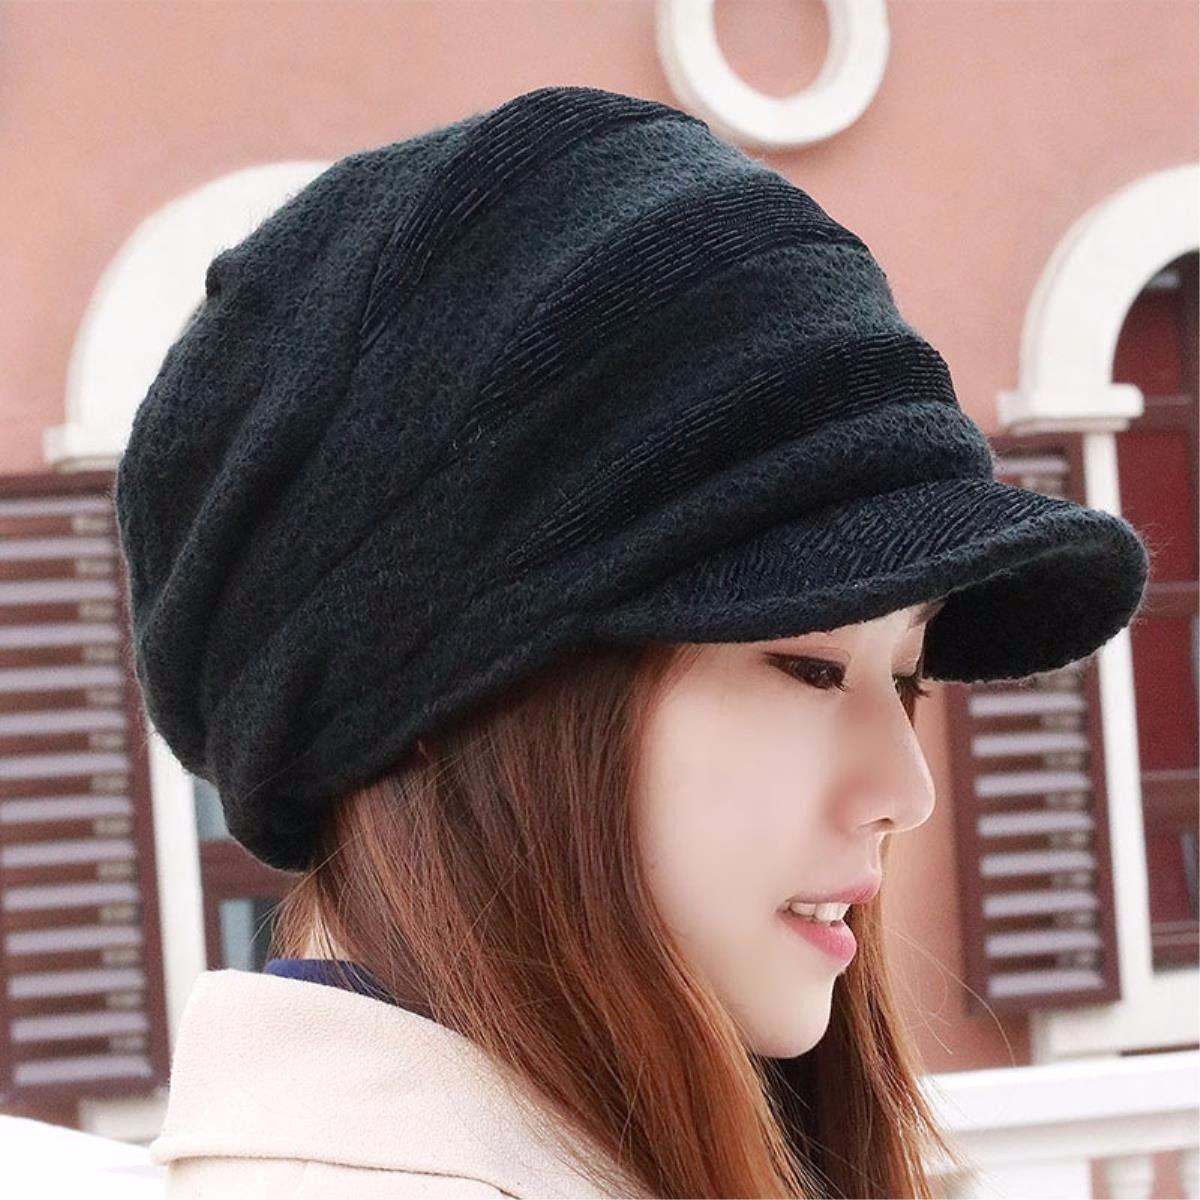 LONFENN Ladies Women Hats Thick Autumn and Winter Ear Hat Knitting Hat Warm Cap Black Large Code